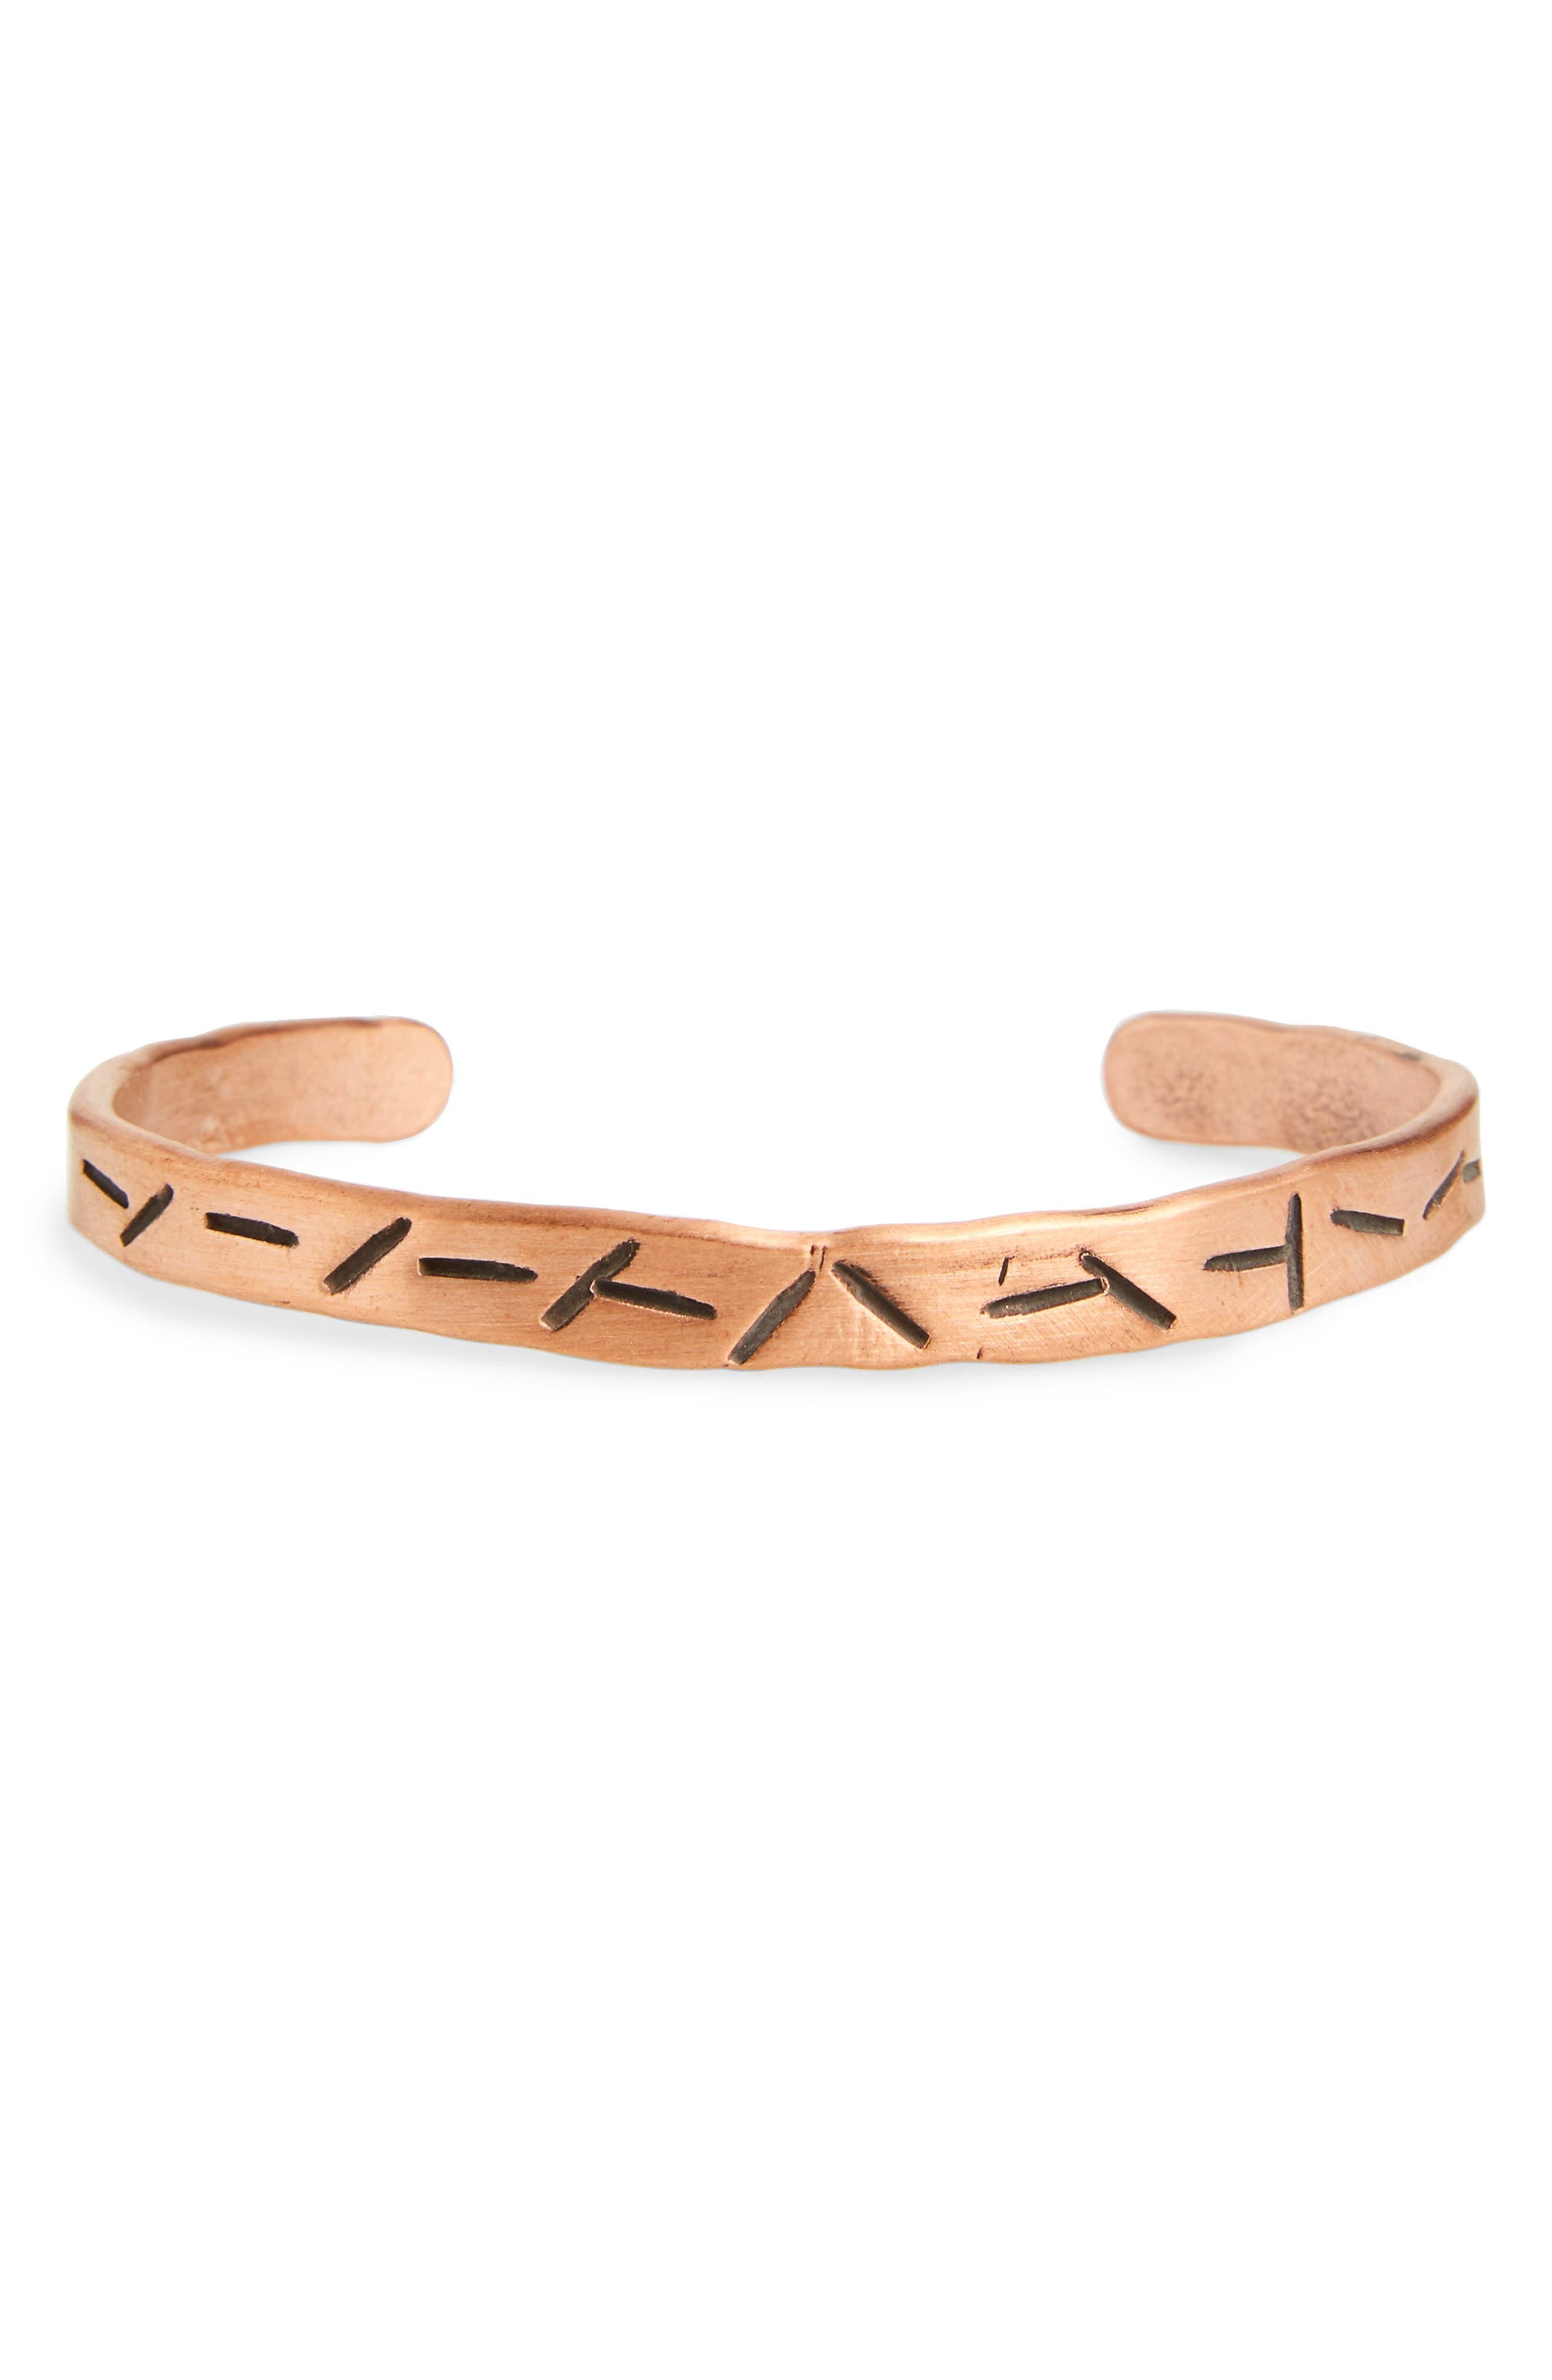 Cause & Effect Slash Copper Cuff Bracelet,                         Main,                         color, Copper